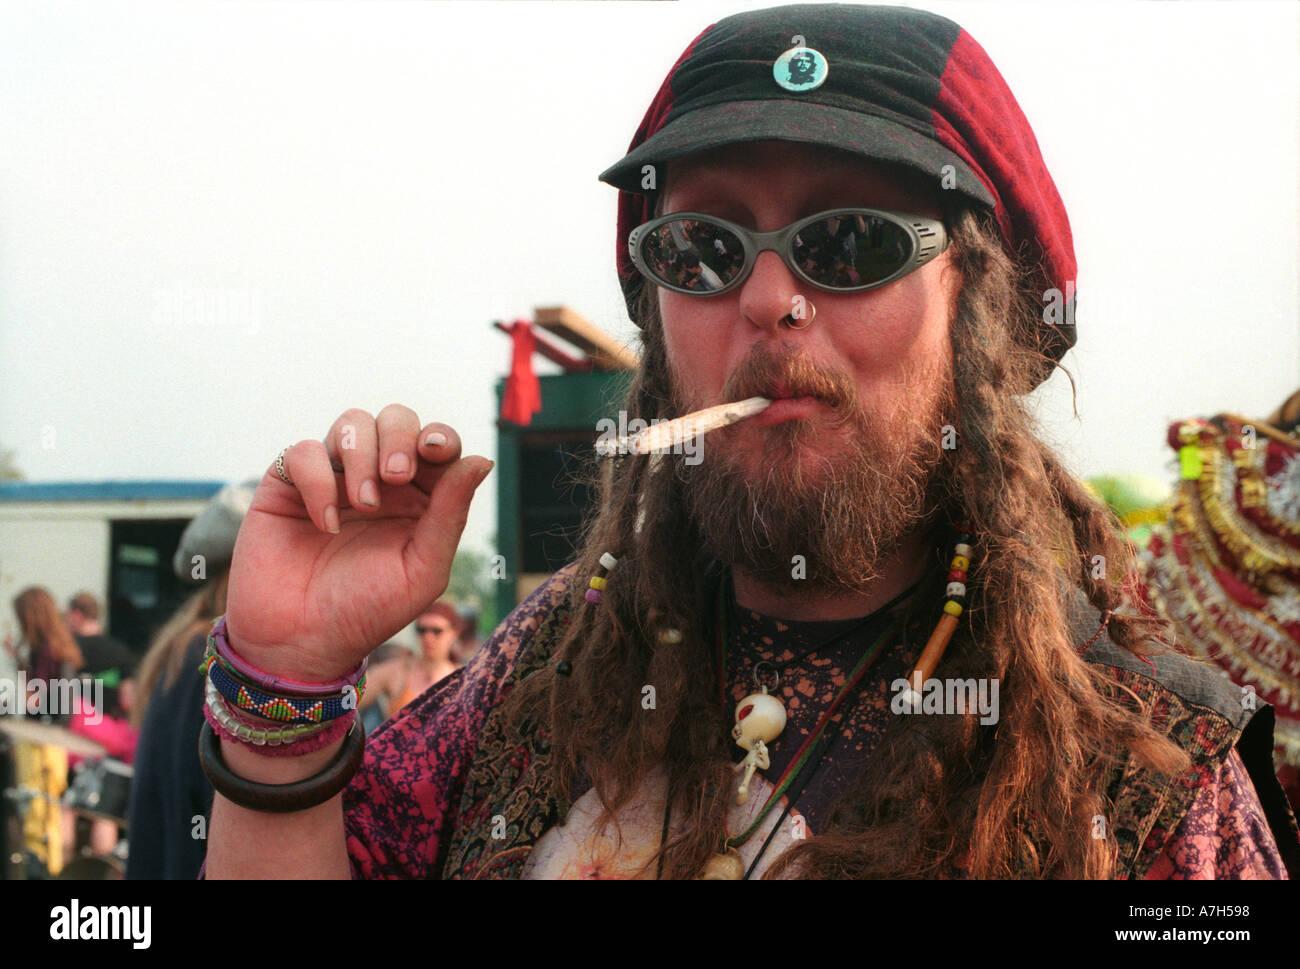 Fumar un gran festival anual conjunta de cannabis en Londres. Foto de stock